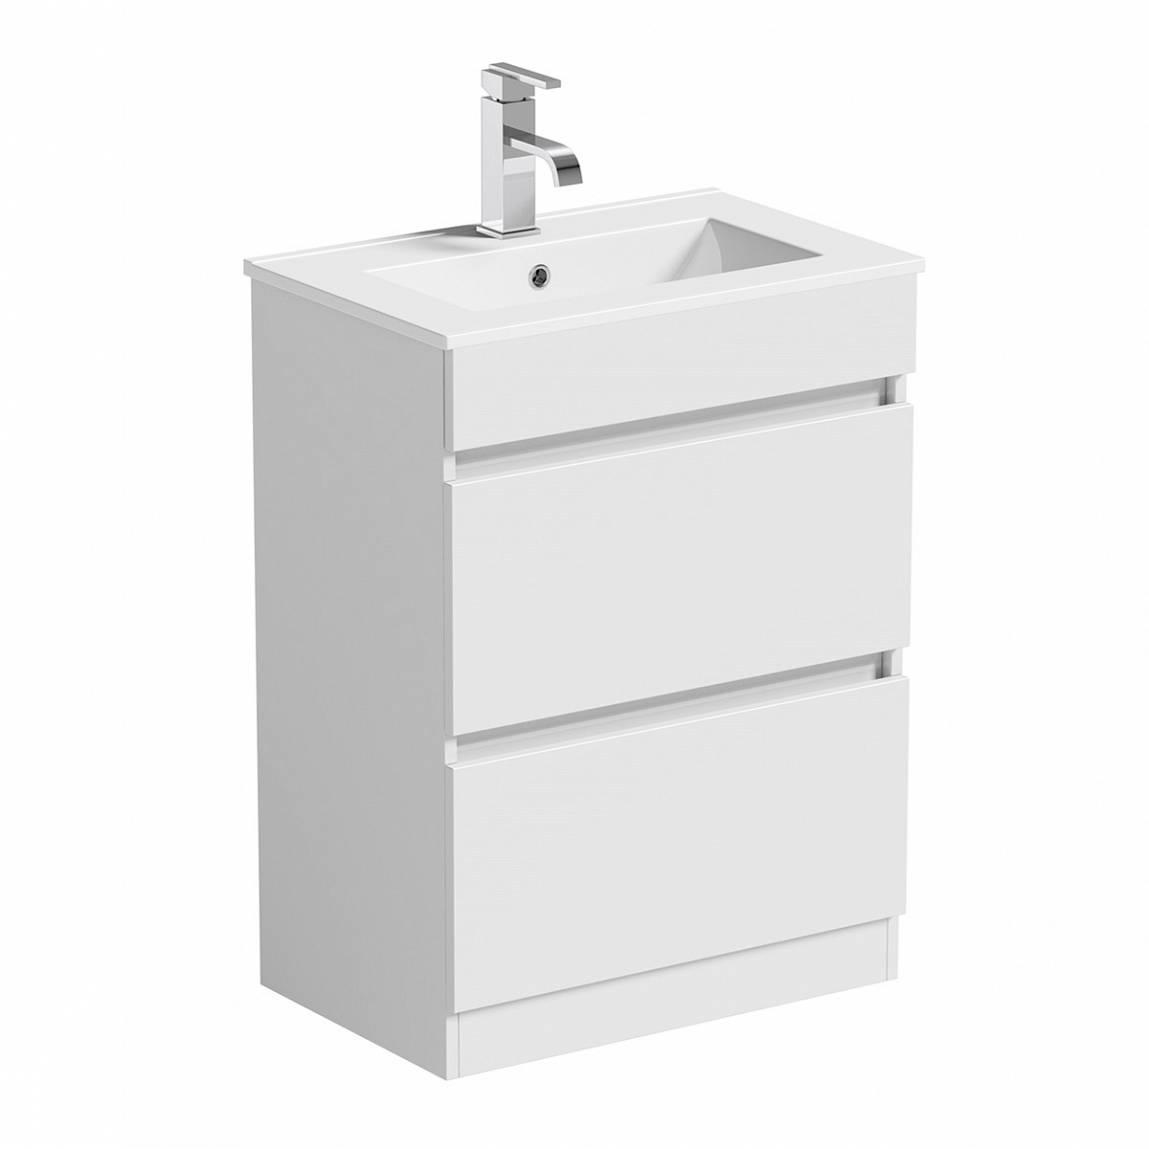 Image of Plan White Floor Mounted 600 Drawer Unit & Basin